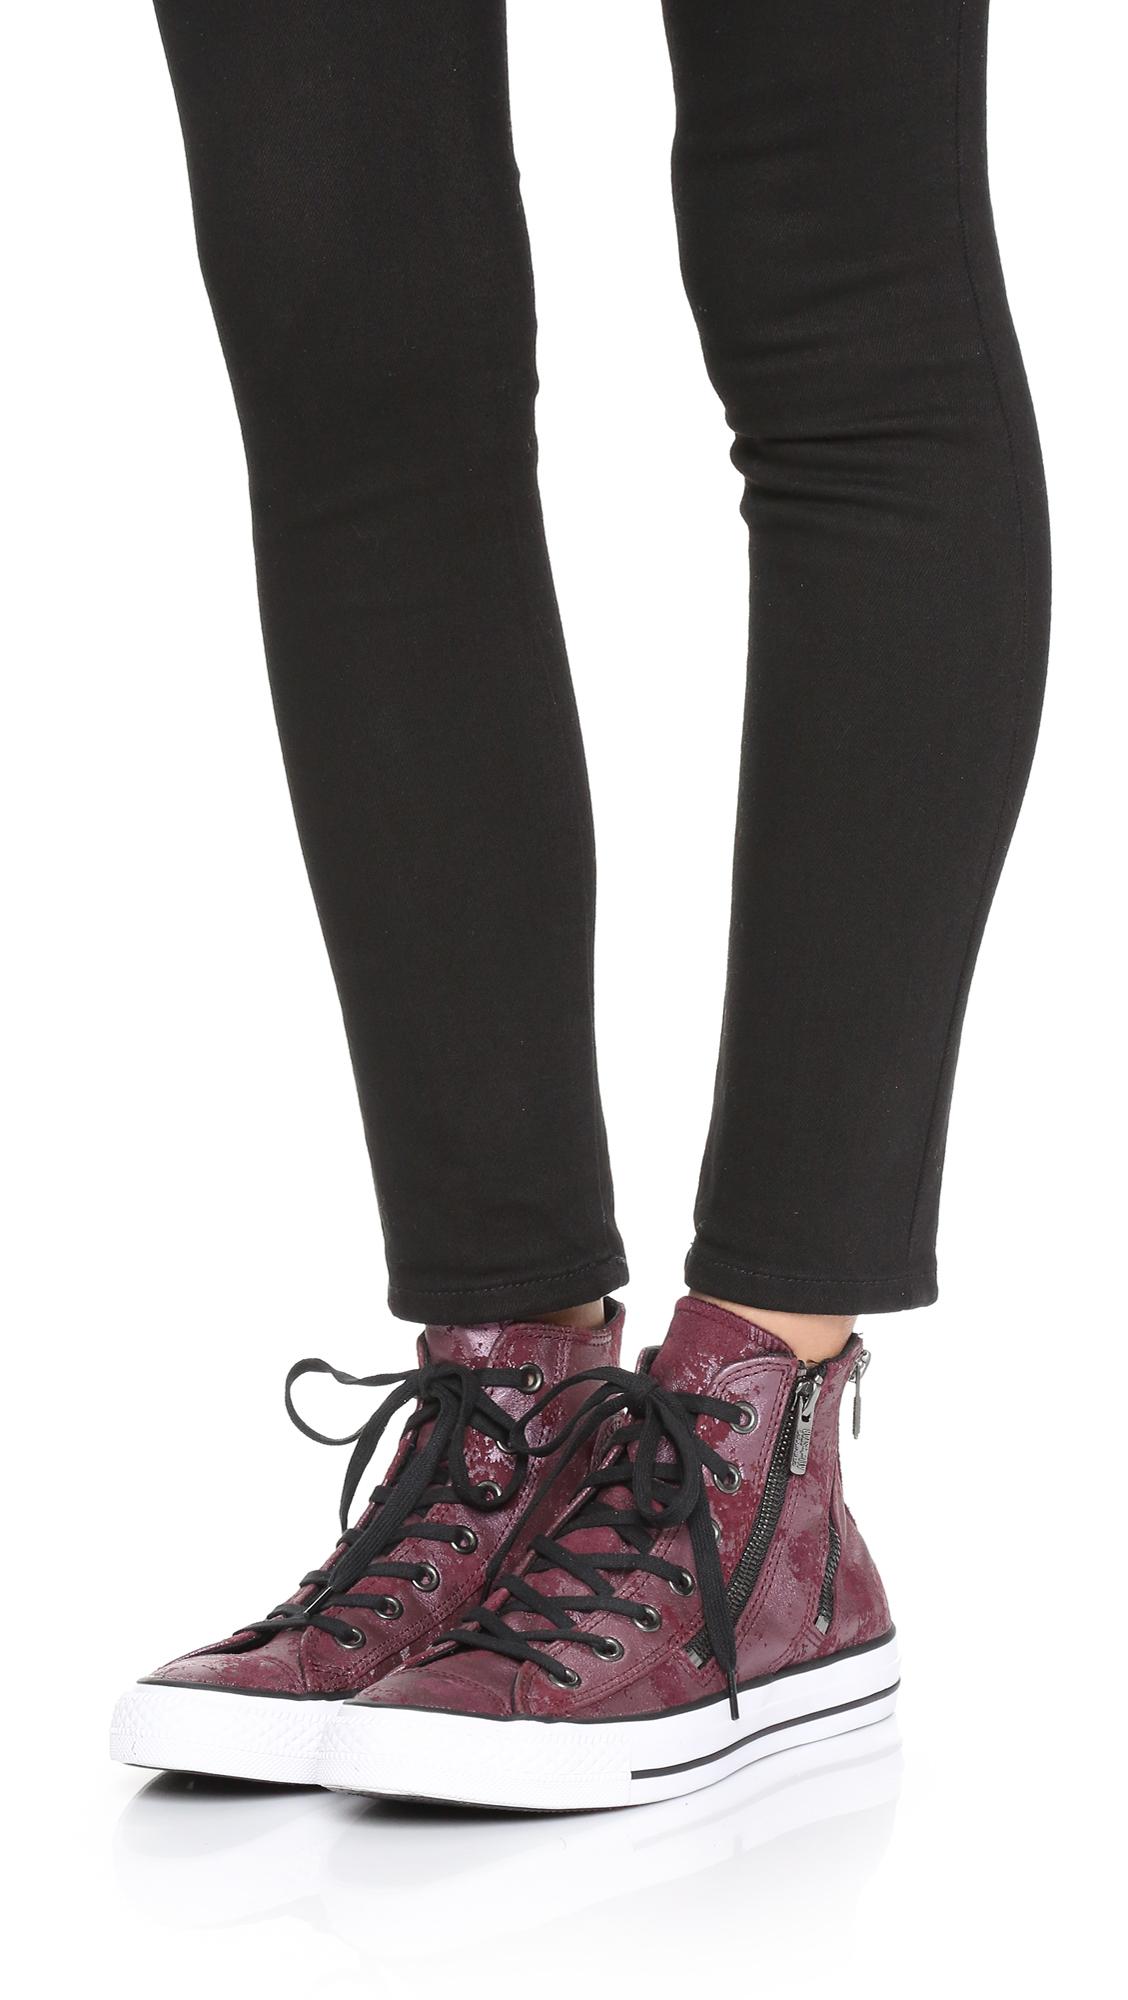 5803b3802e389 reduced converse chuck taylor all star dual zip high top sneakers deep  c87a9 4e163